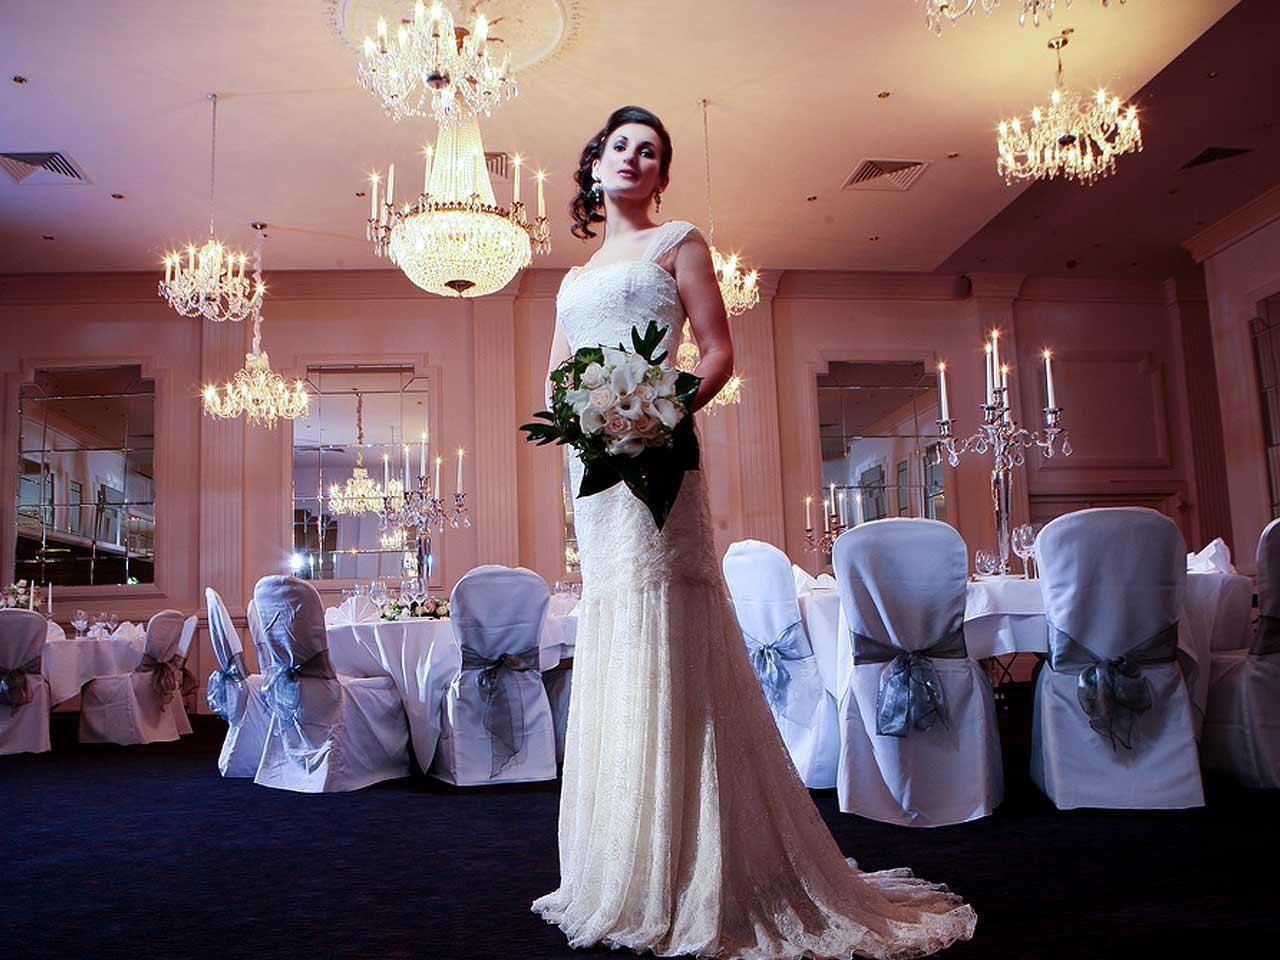 Information Weddings